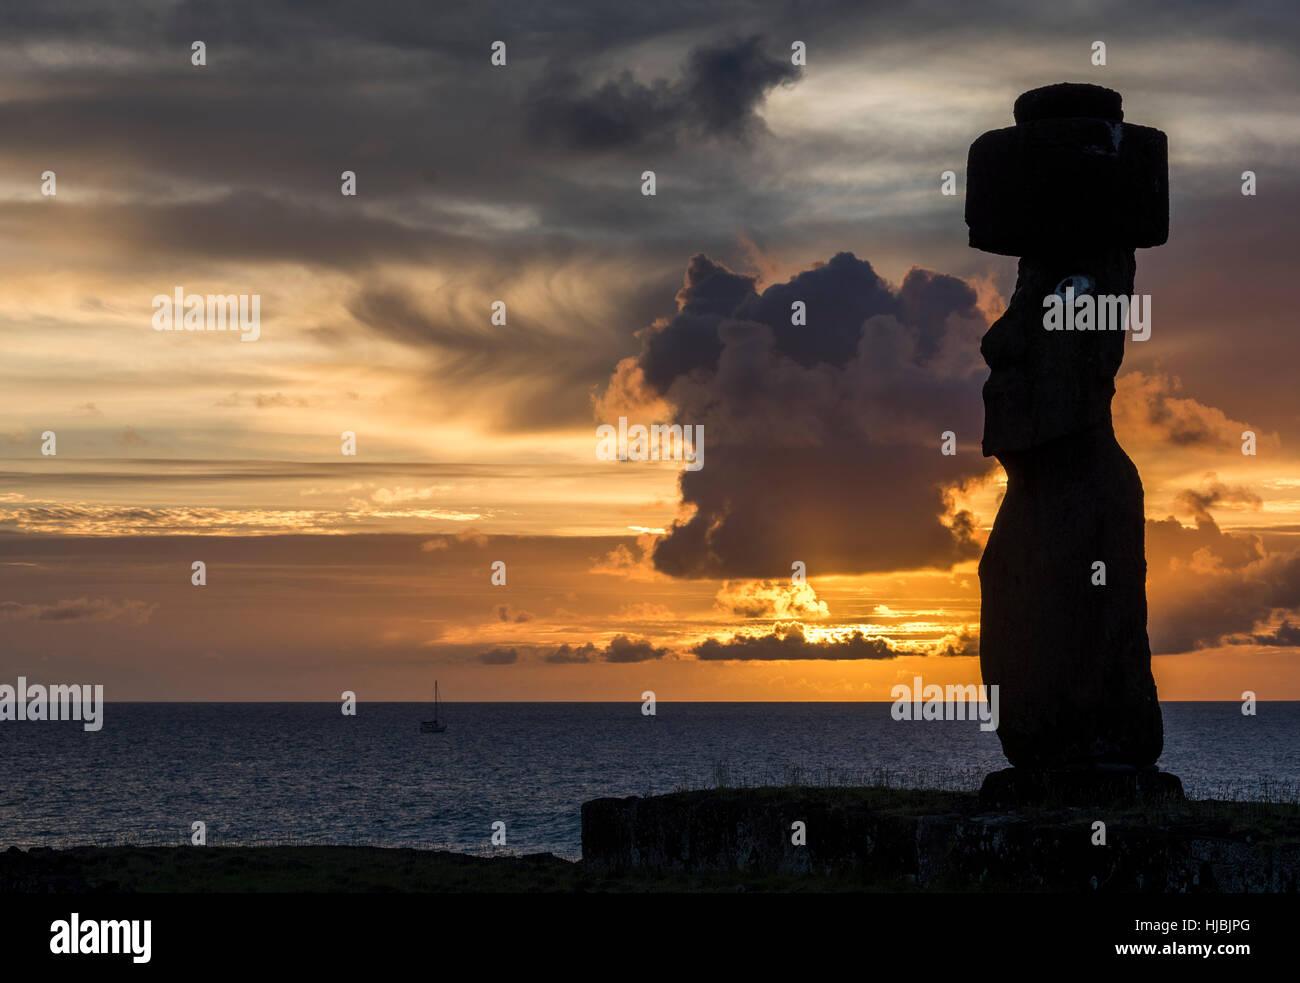 Statuen (Moai) auf der Osterinsel, Chile Stockbild